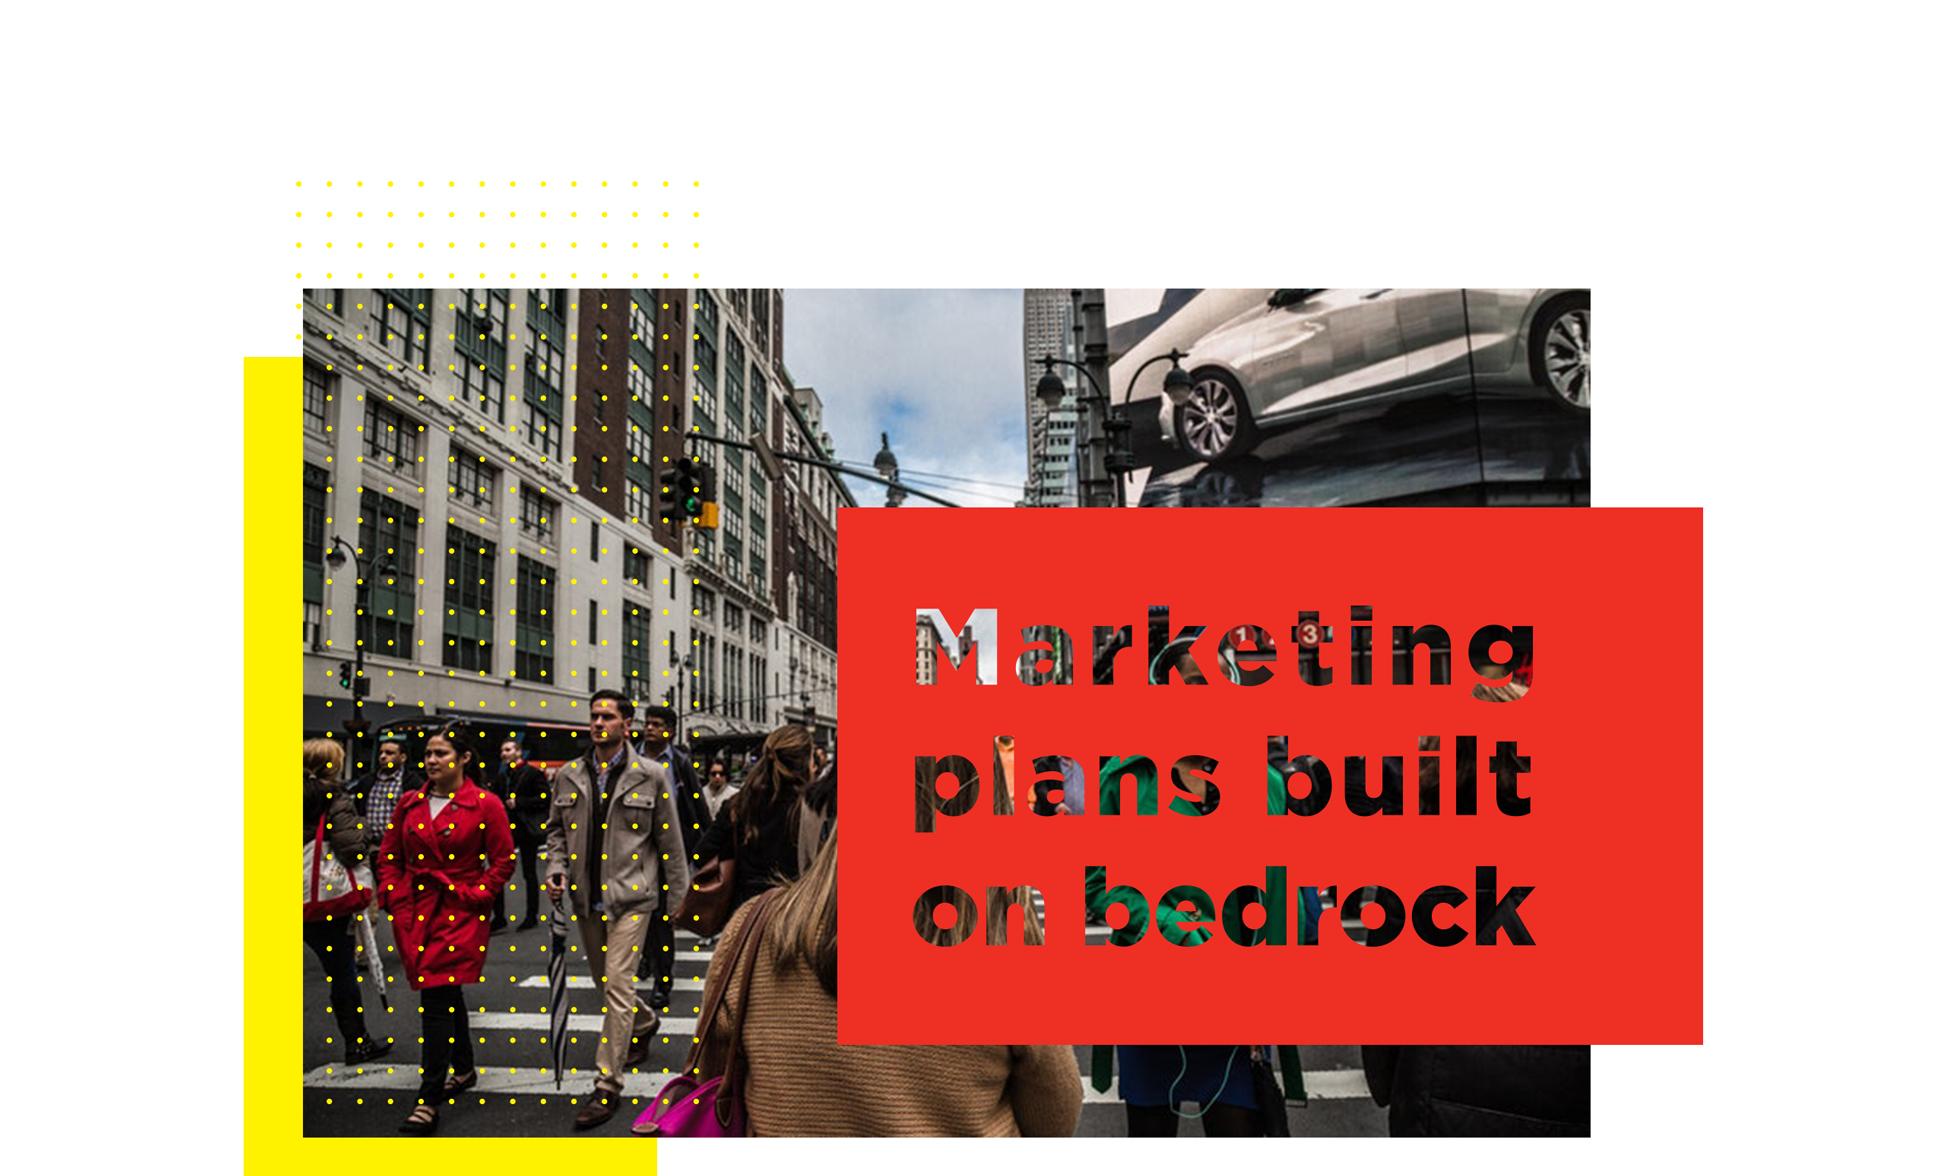 marketingplansonbedrocks.jpg